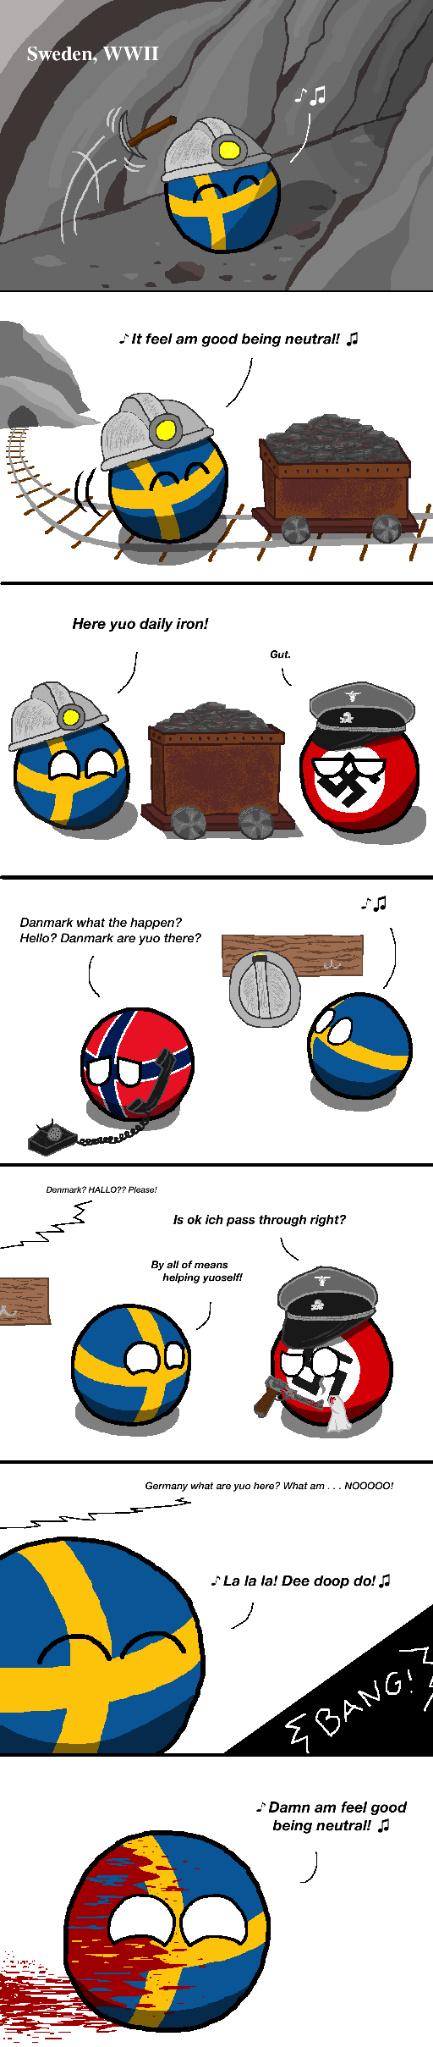 Sweden the neutral - meme